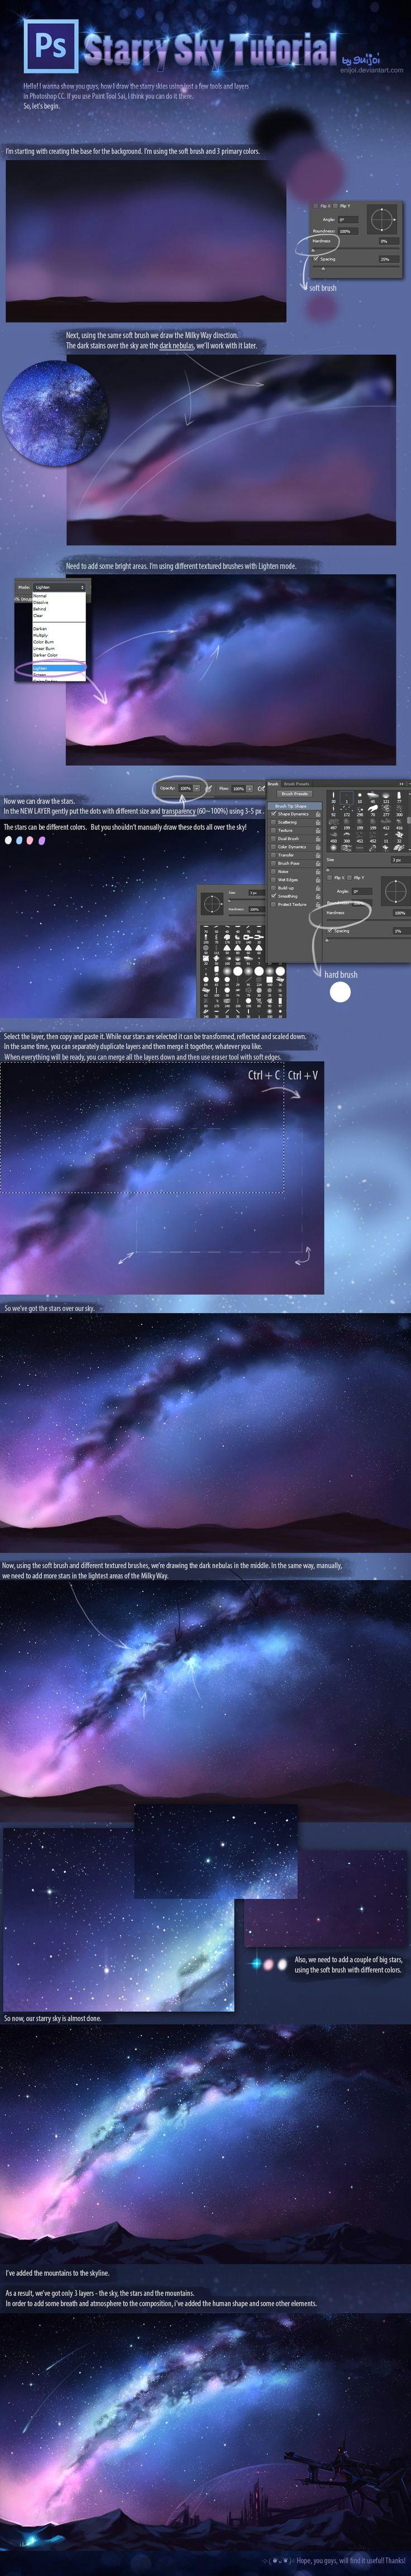 starry sky tutorial by enijoi deviantart com on deviantart